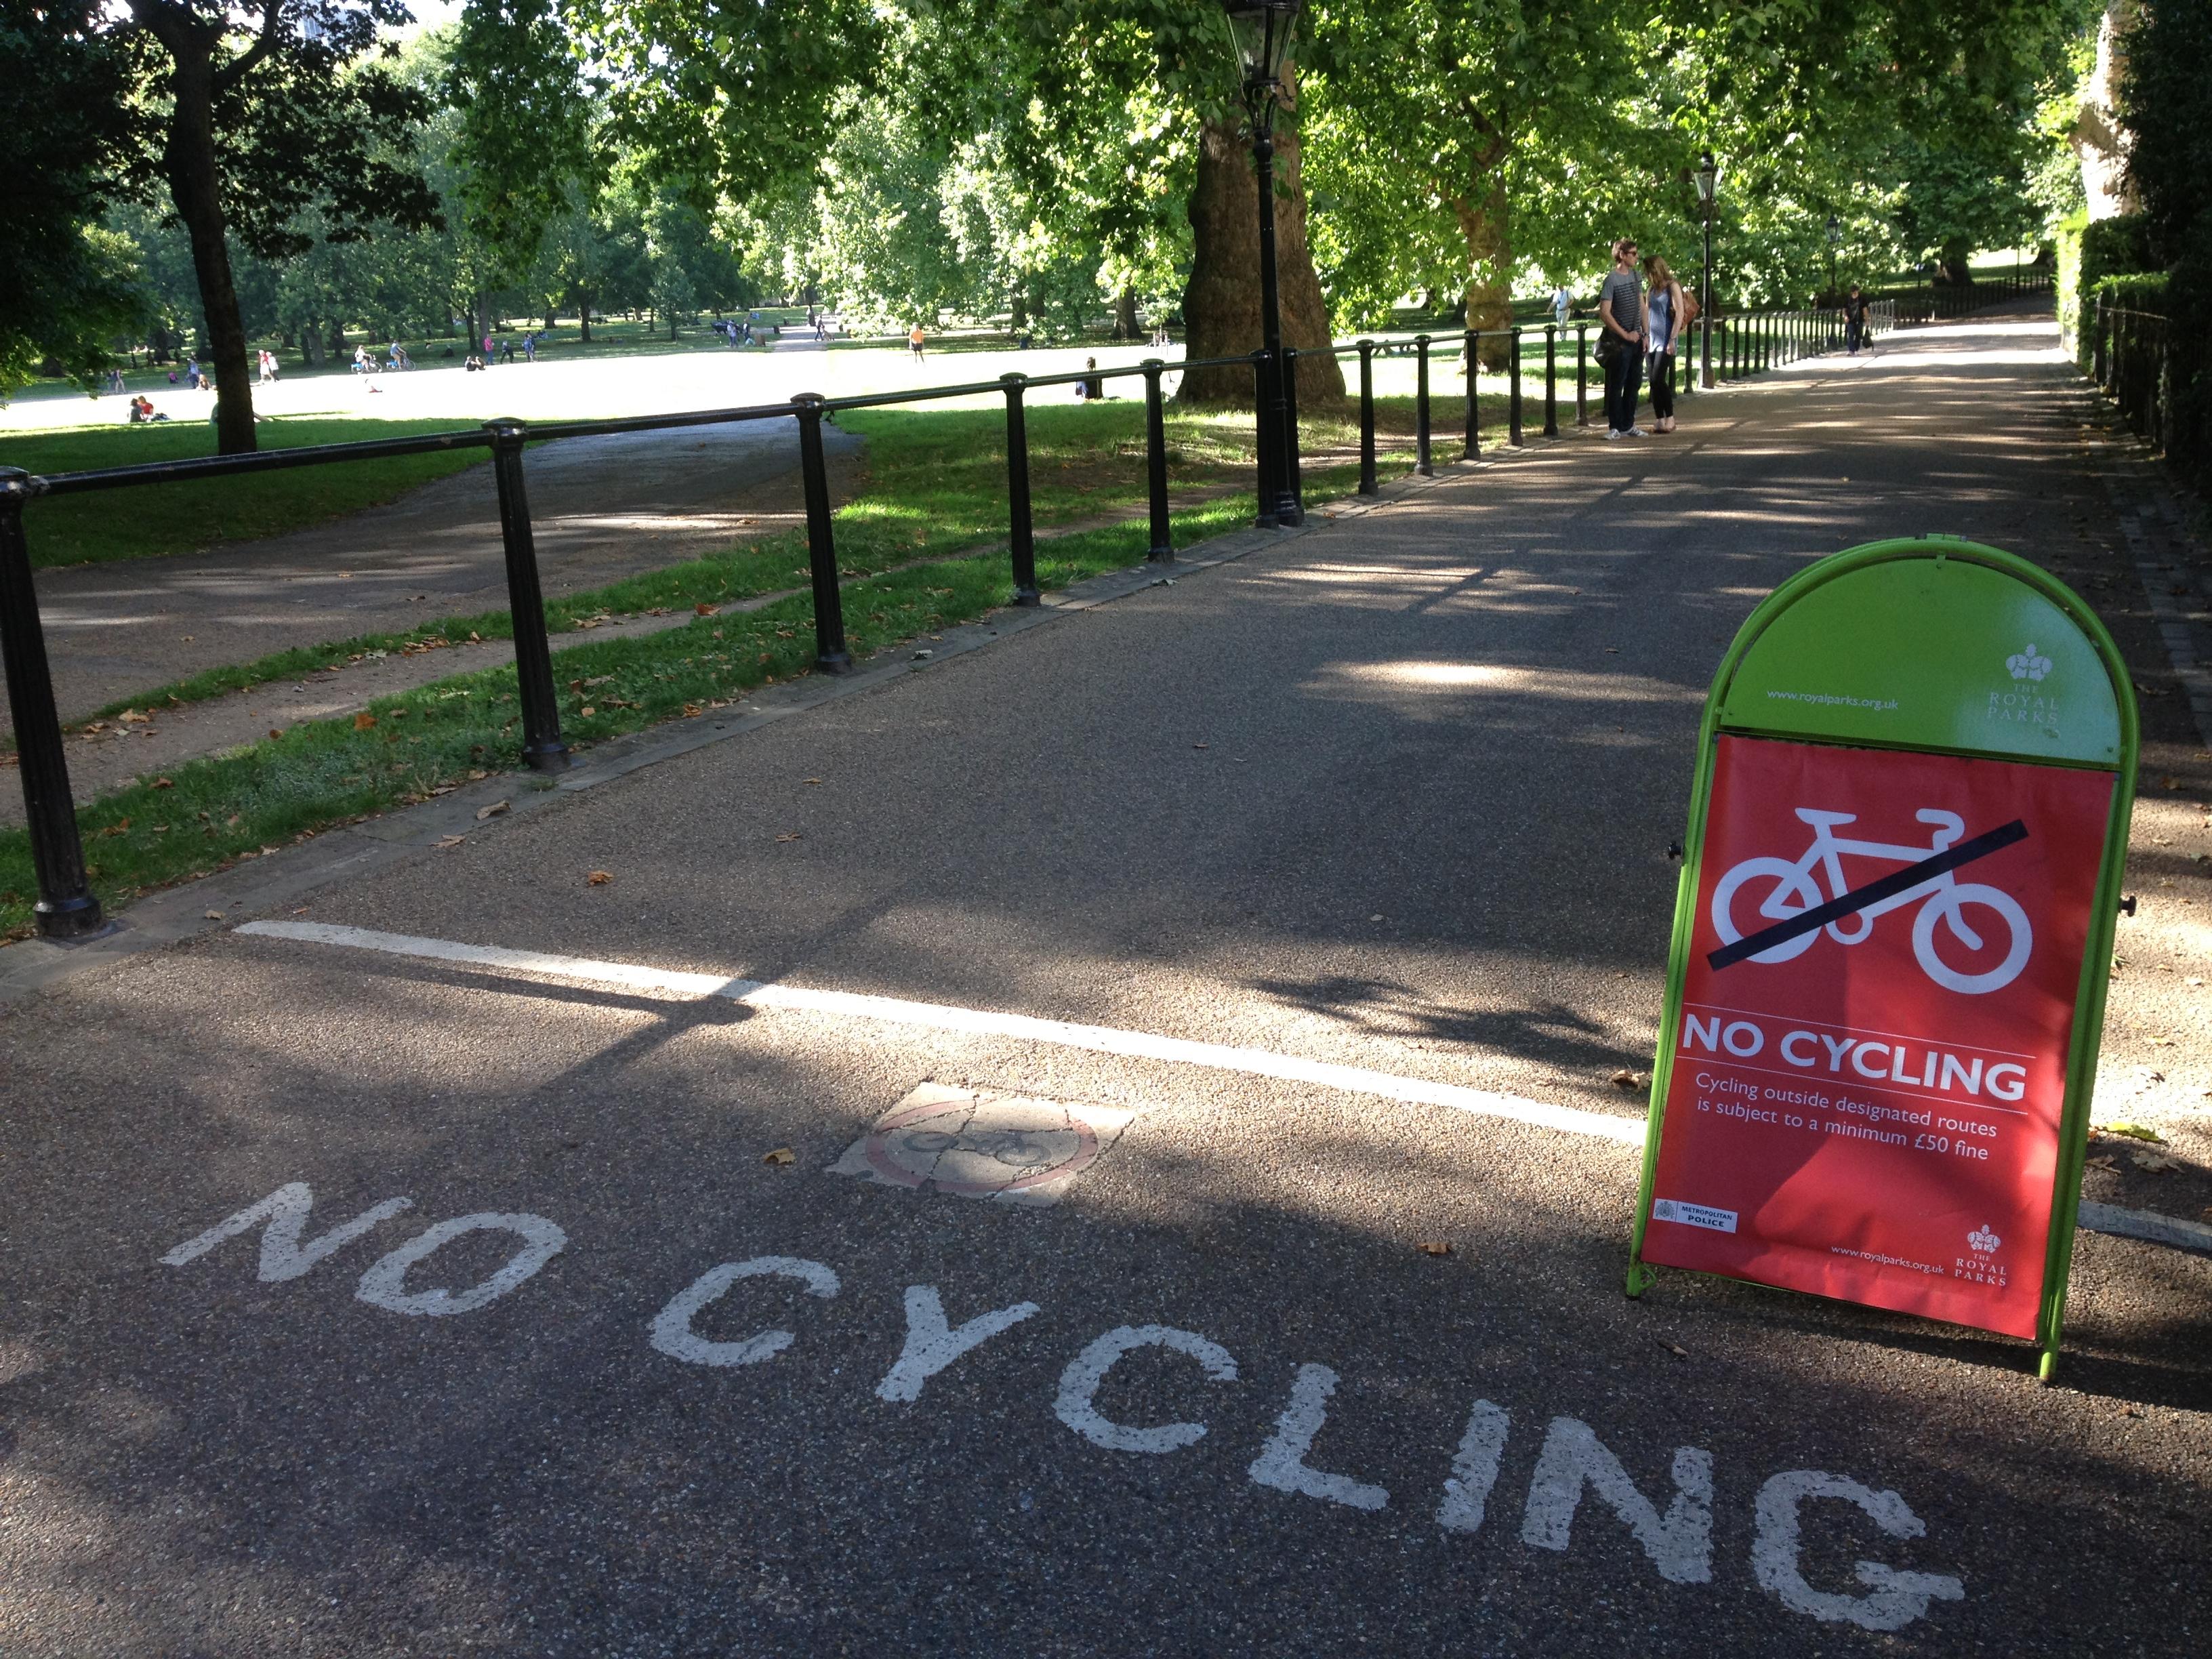 No cycling